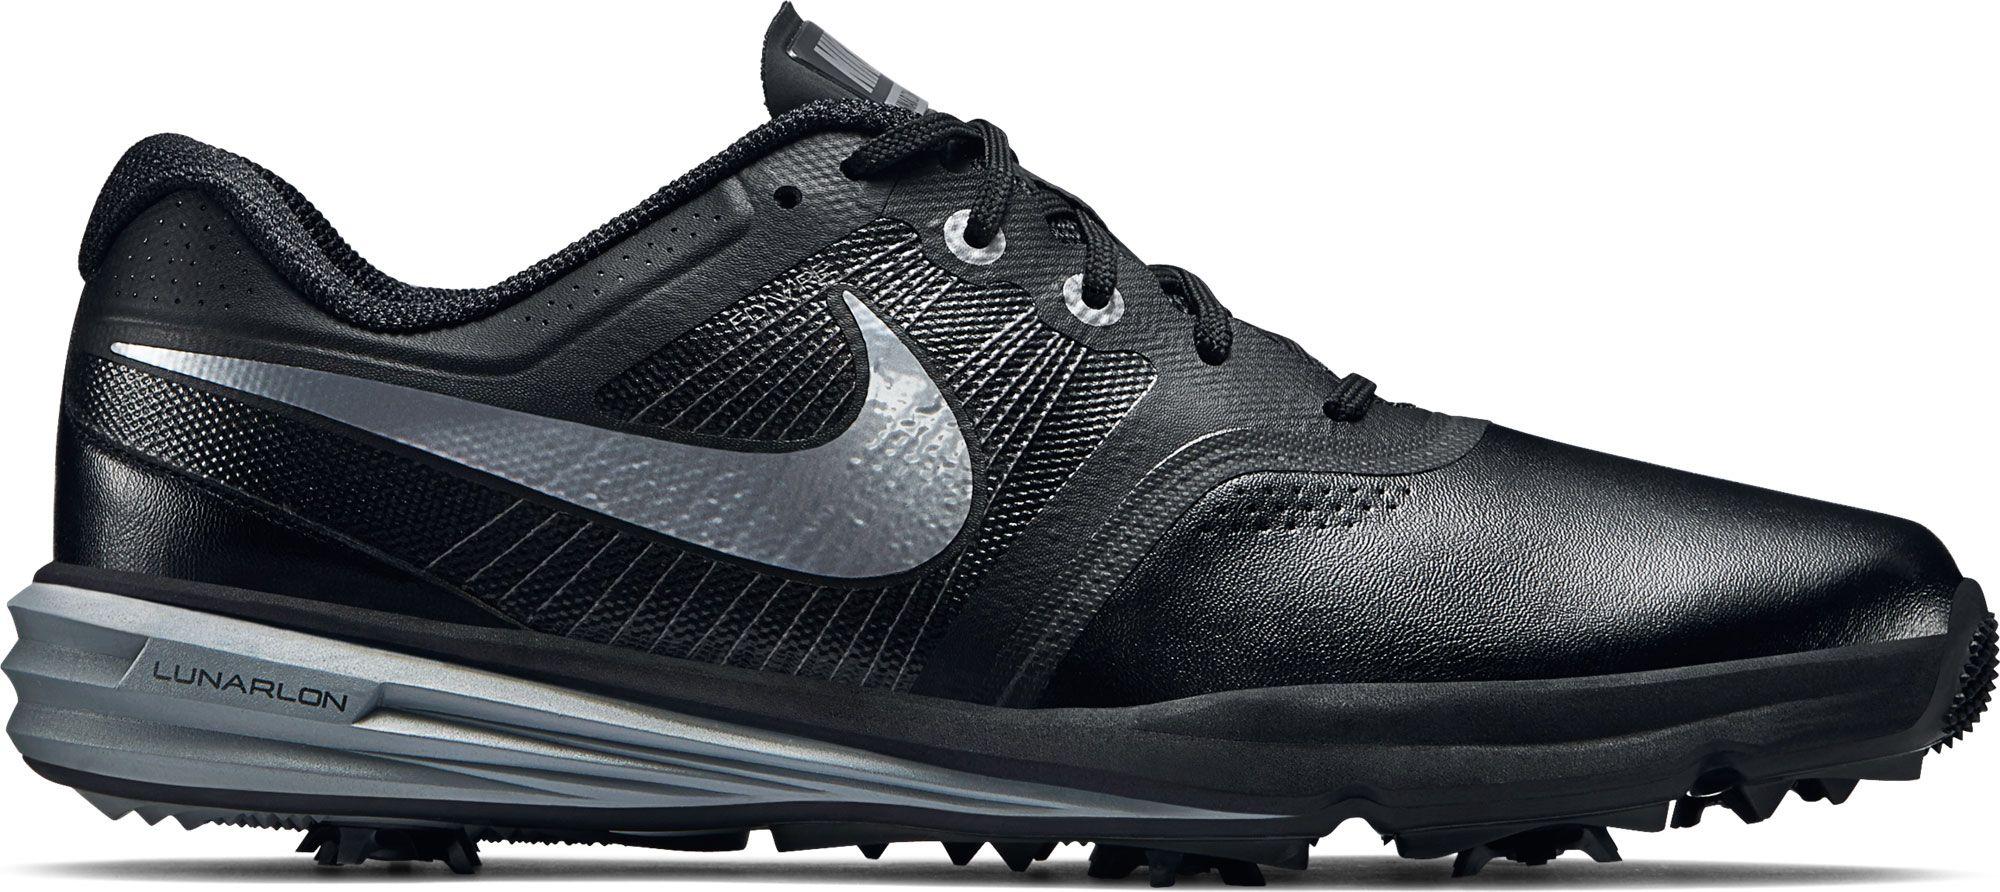 buy popular 5cc2f e0319 Nike Lunar Command Golf Shoes . nike lunar control 2 replacement spikes ...